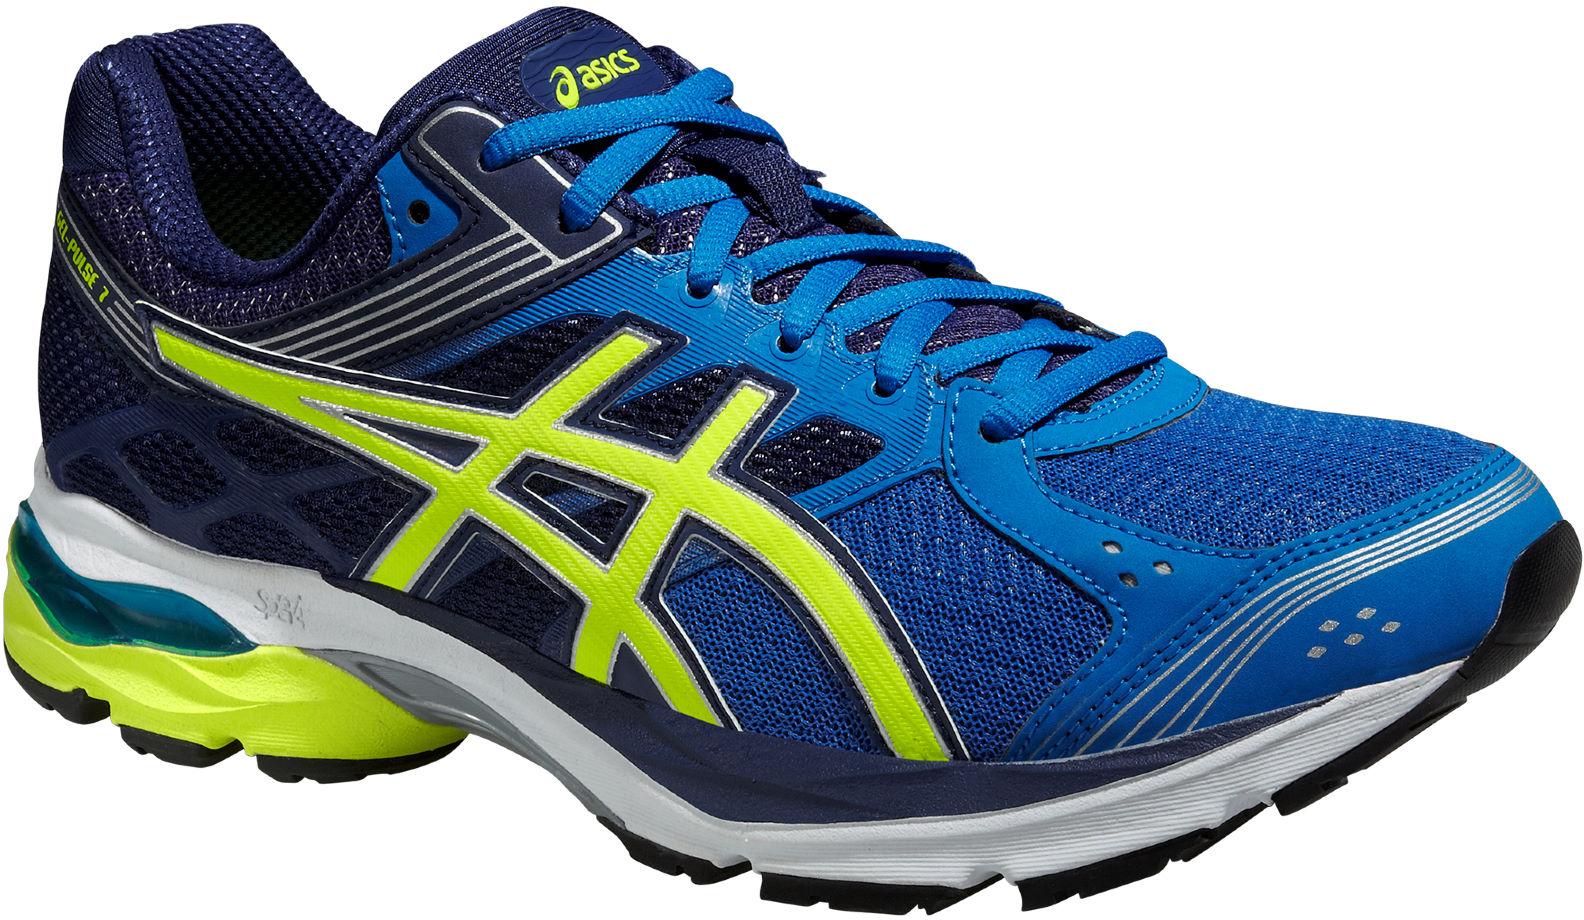 asics gel pulse asics gel-pulse 7 shoes (aw15) XNGBTEJ